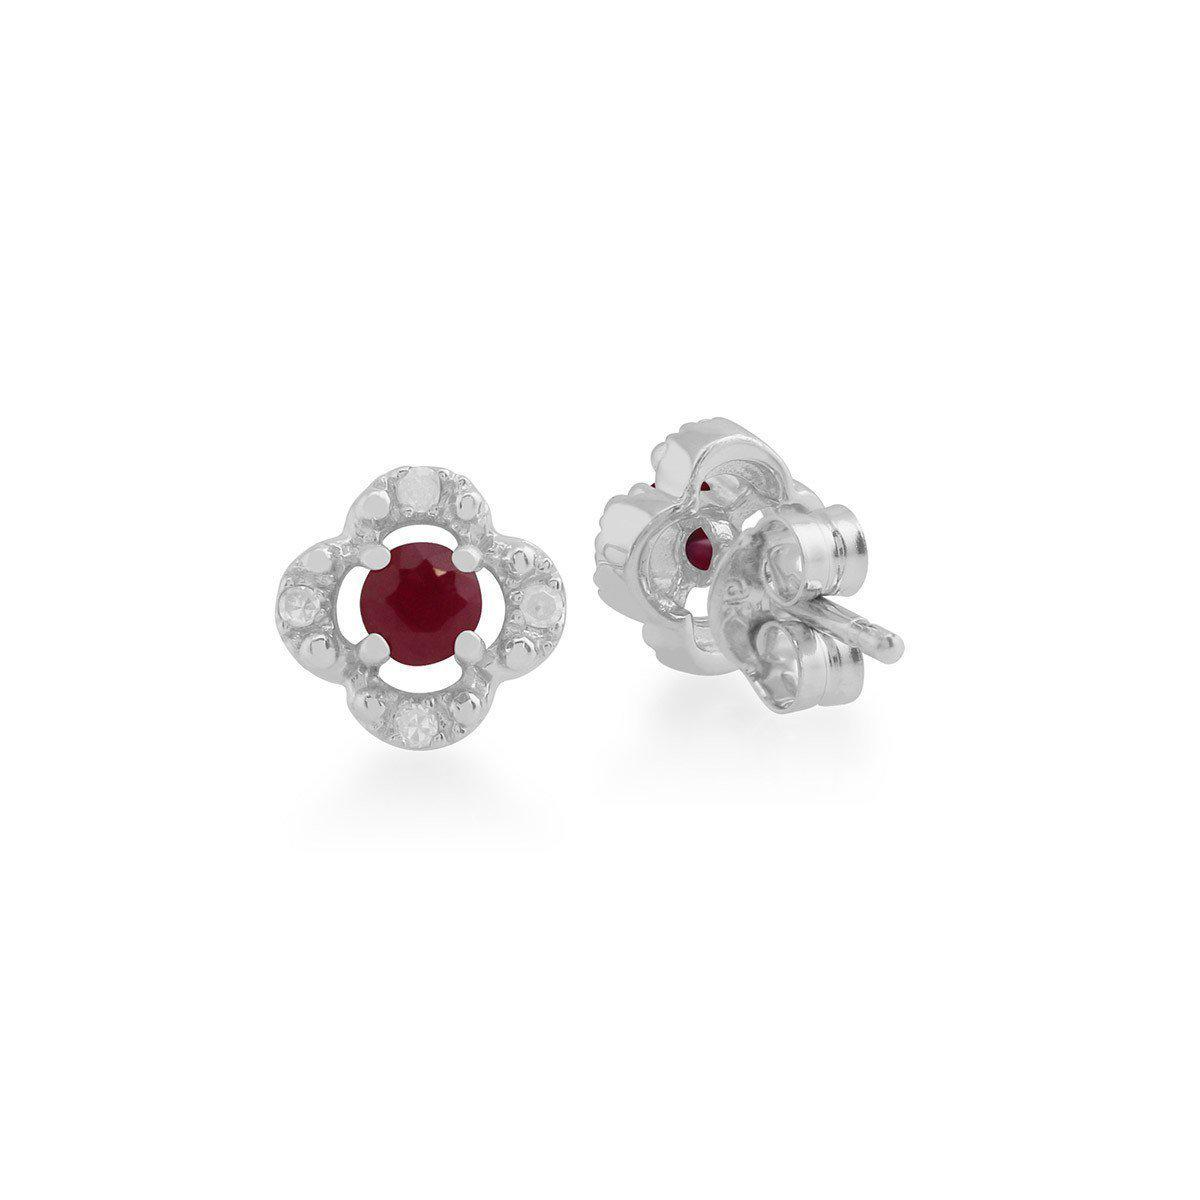 5d5761ed490dc1 Lyst - Gemondo Jewellery Ruby And Diamond Quatrefoil Stud Earrings